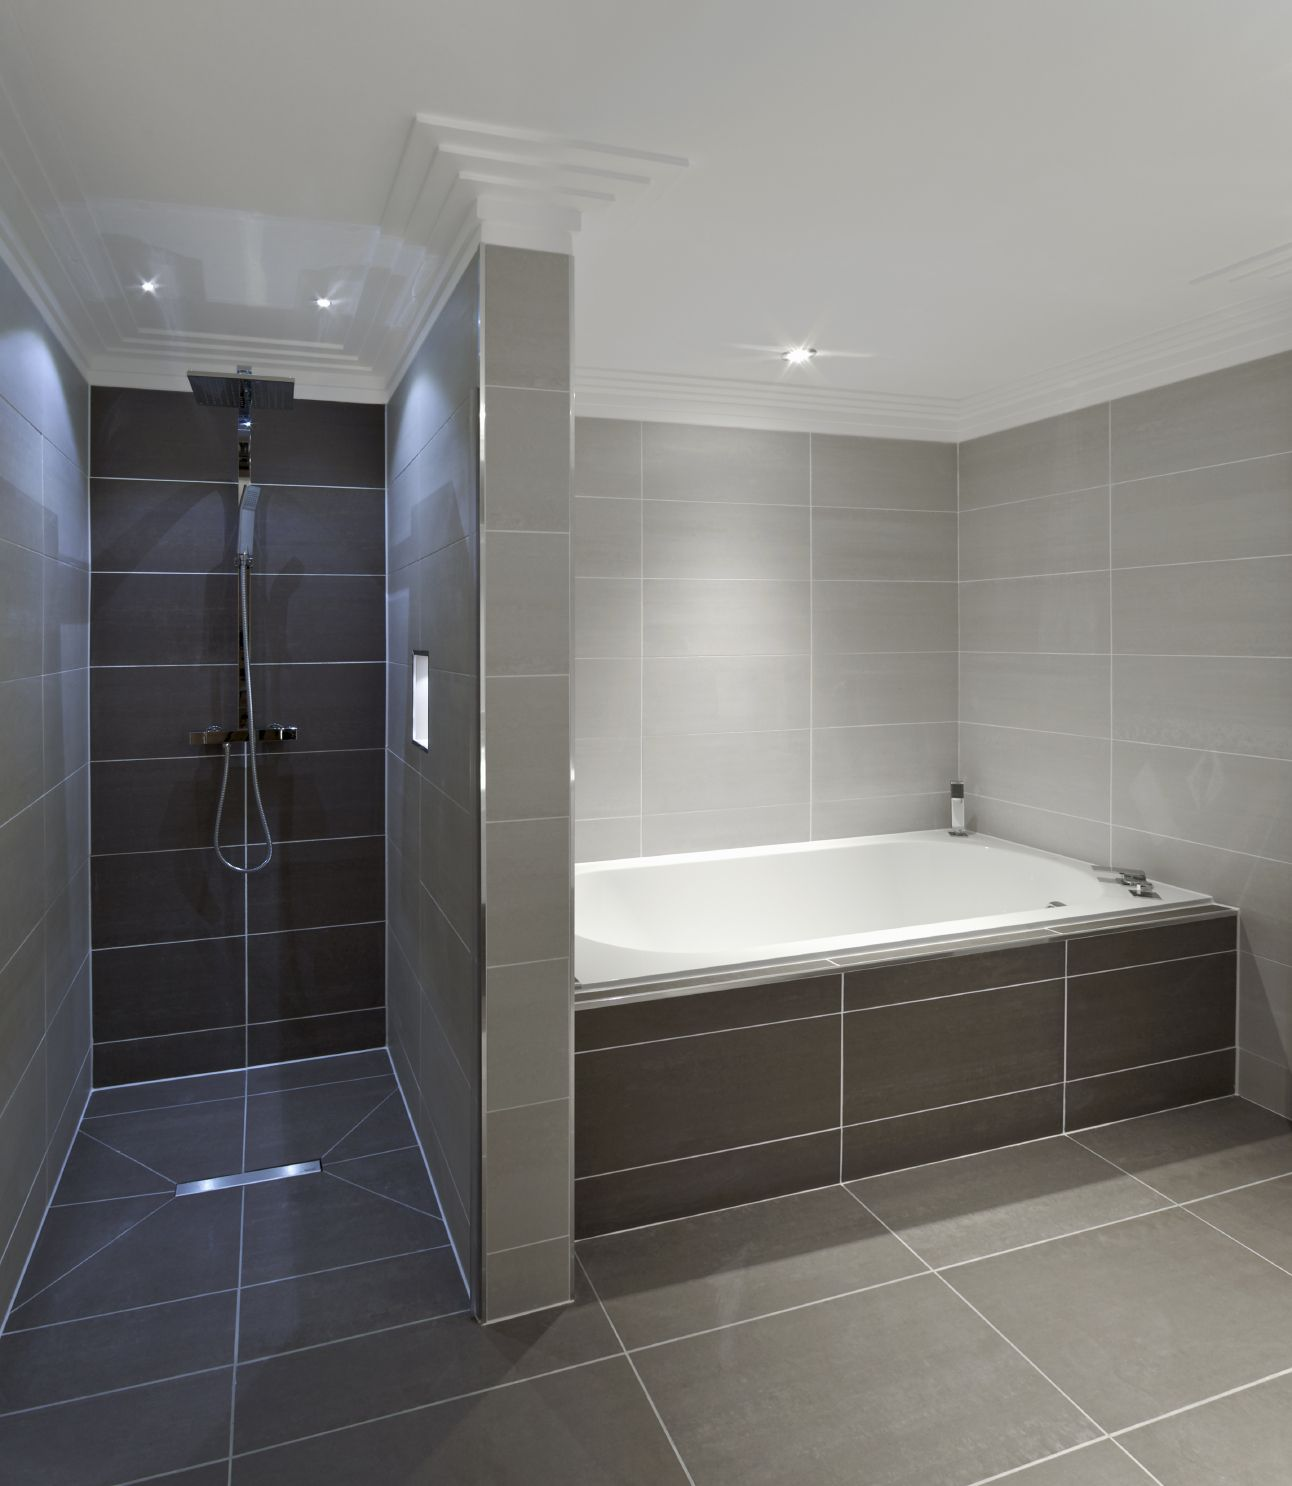 Kleines hotelbadezimmerdesign inloopdouchebak  google zoeken  home  pinterest  bath house and